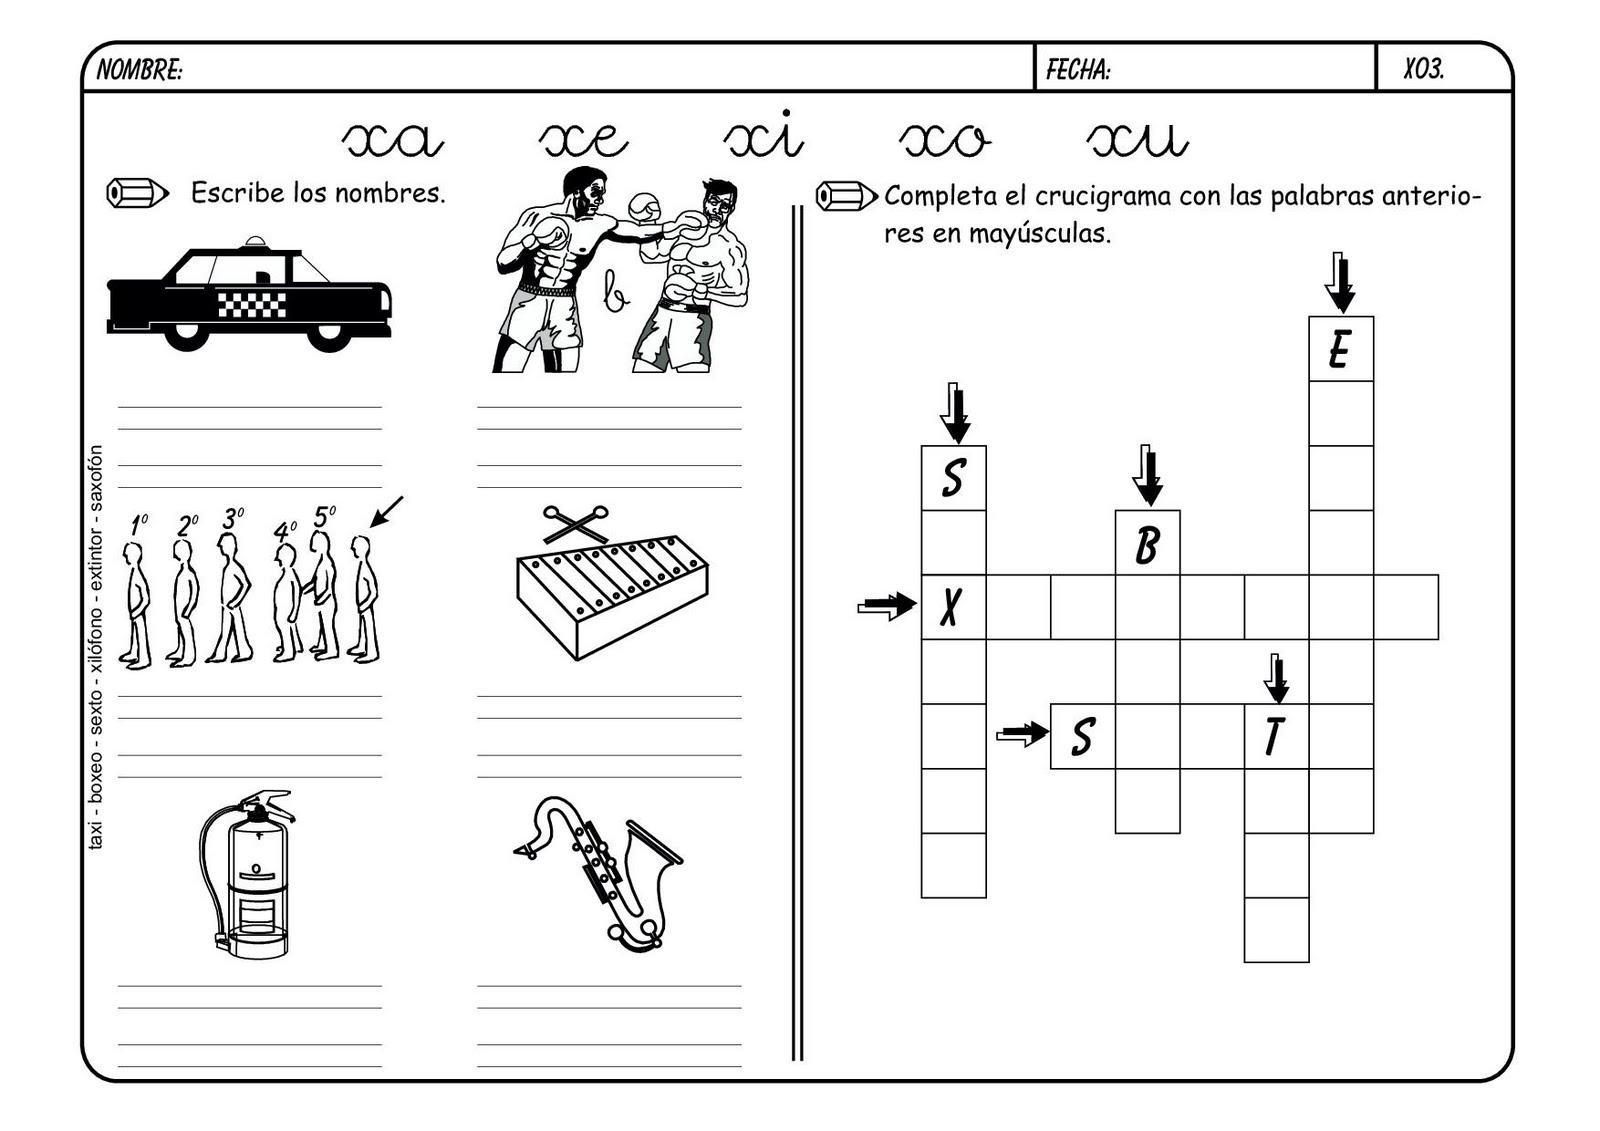 Combinaciones Entre Consonantes T,F,J,Z,N,X,H,V,B - Lessons - Tes Teach